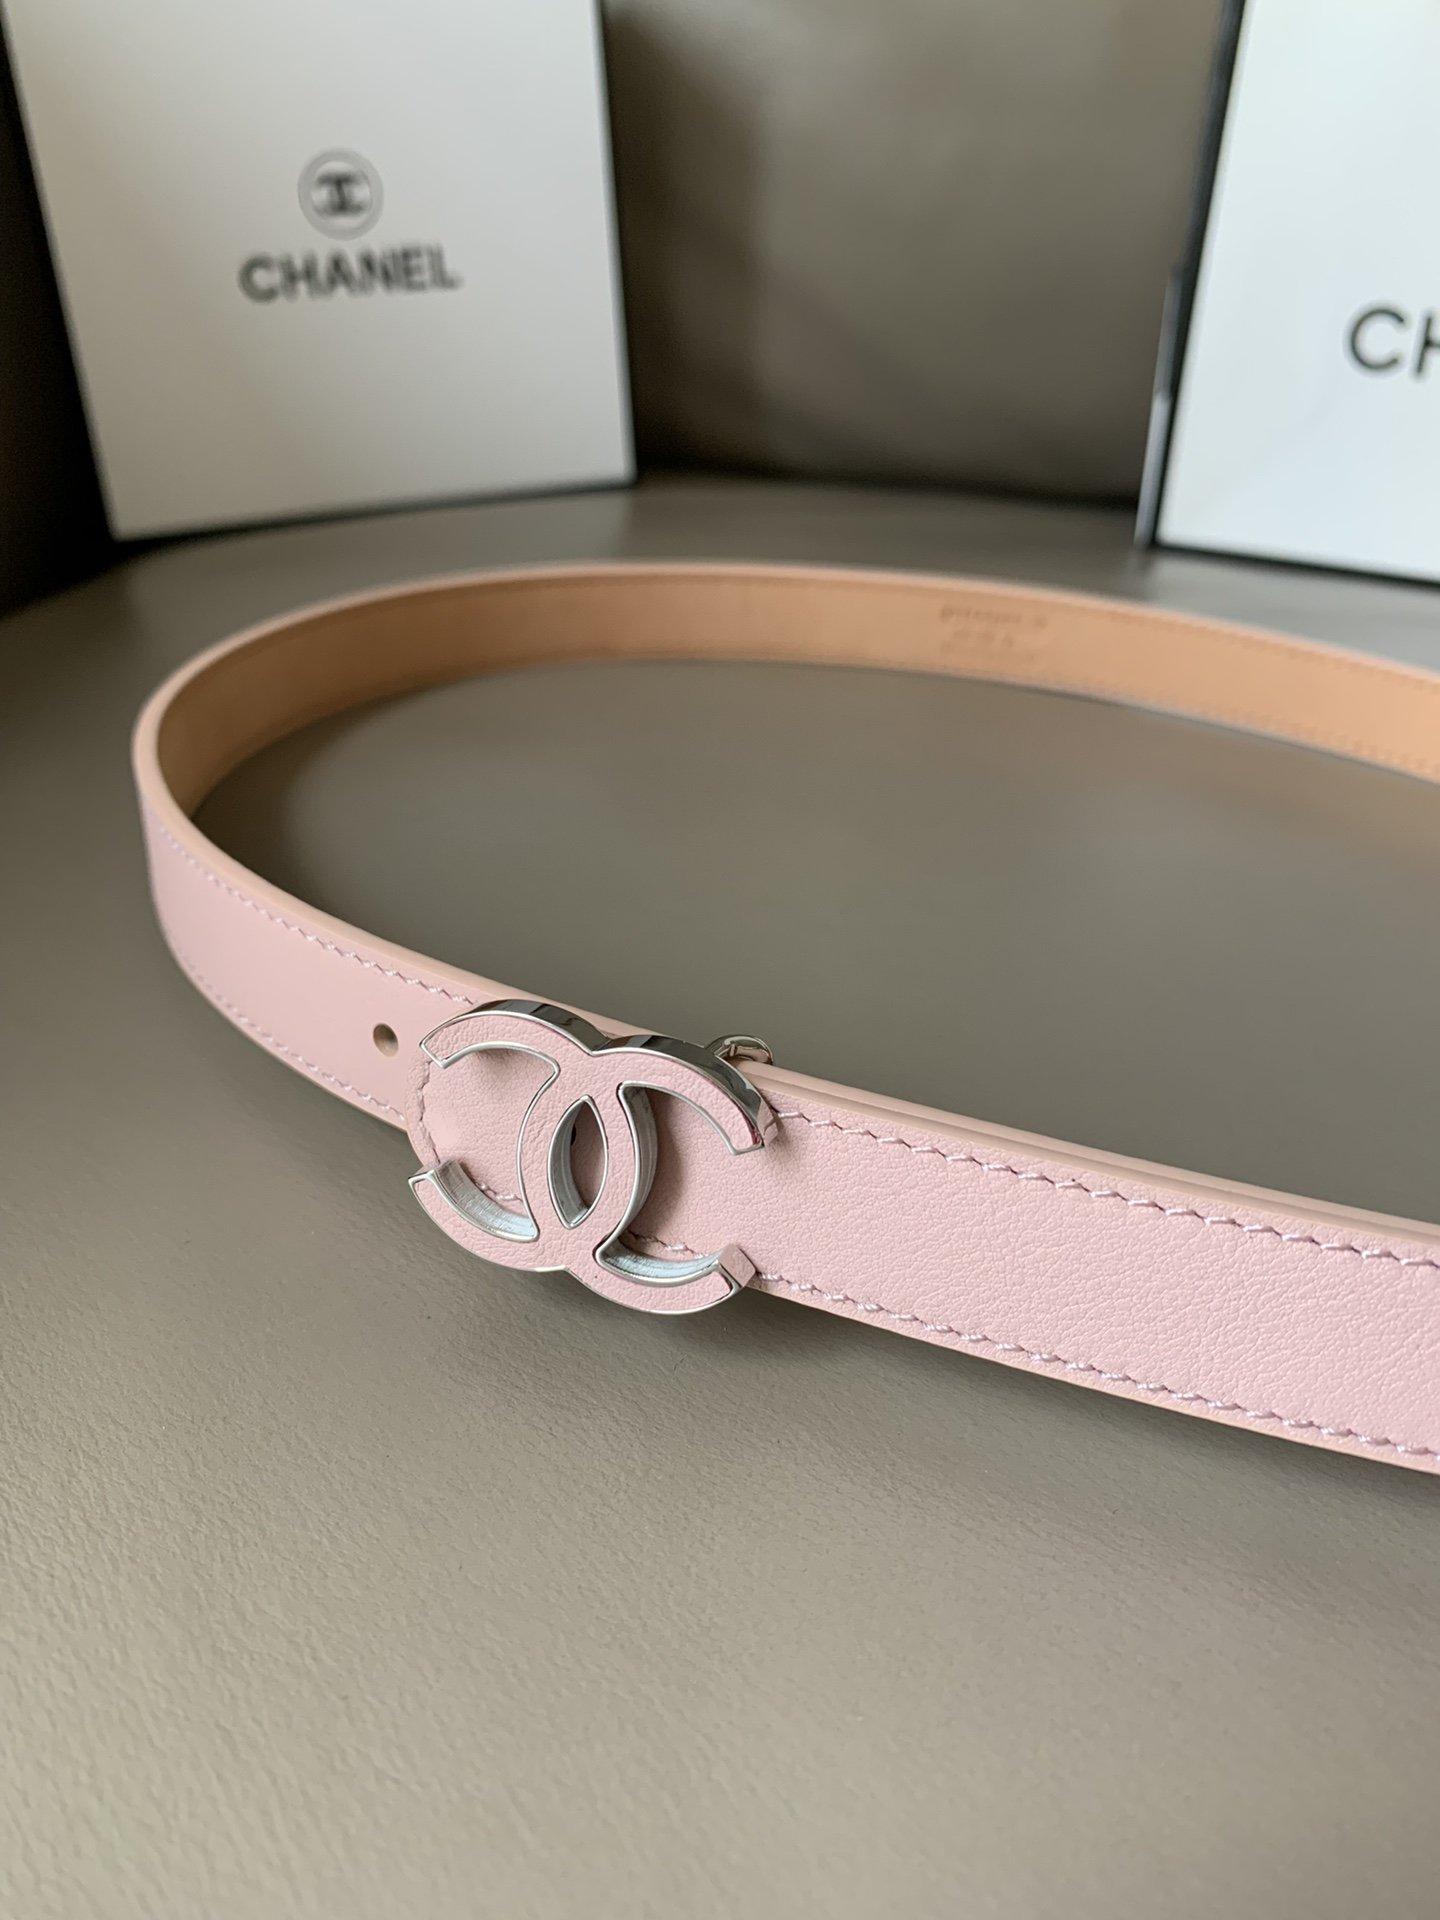 Chanel香奈儿专柜新款 高端女士休闲细腰带(图8)